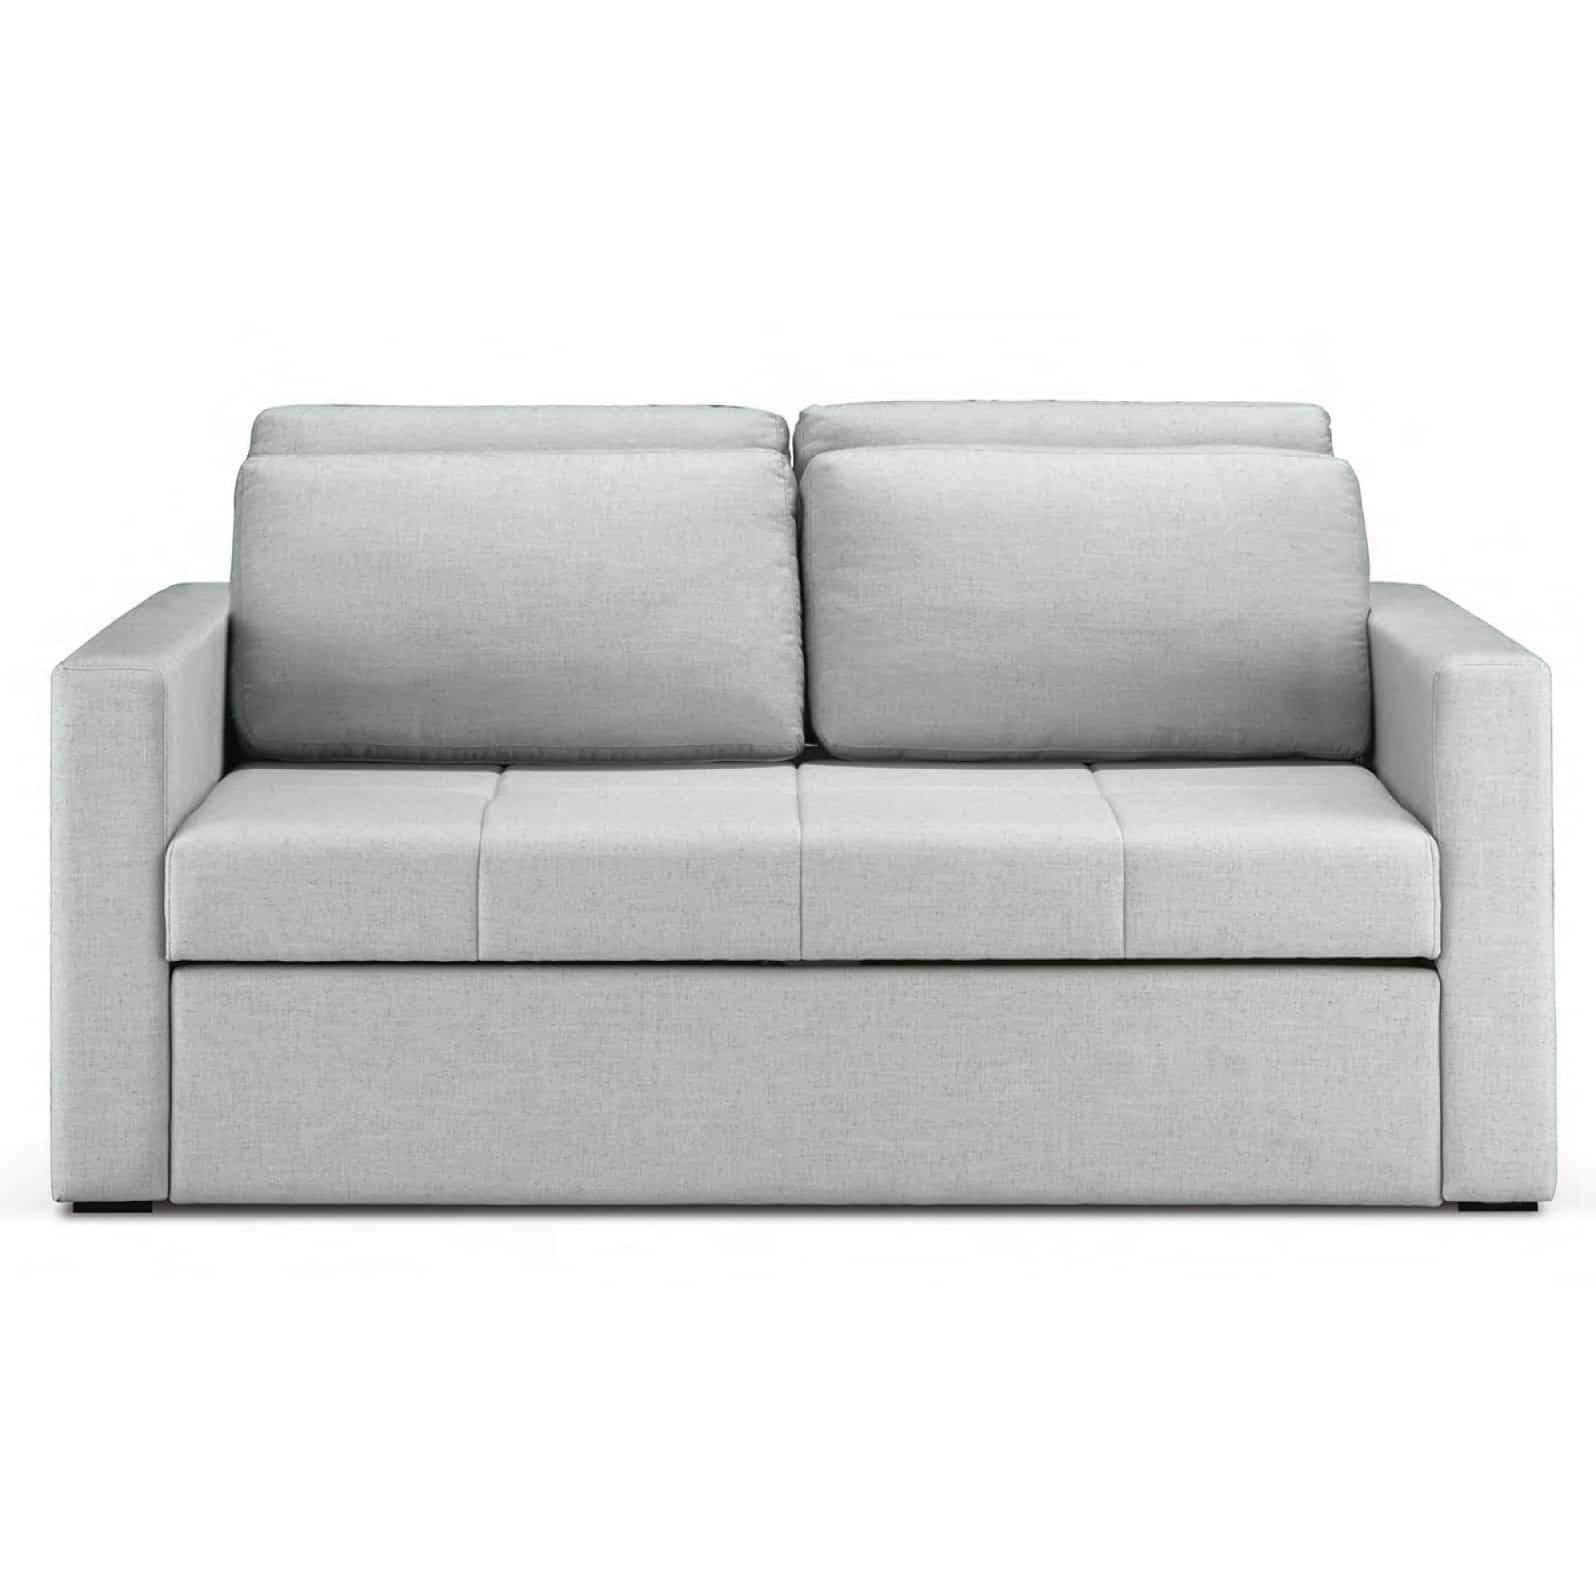 Sofa-cama-arbor